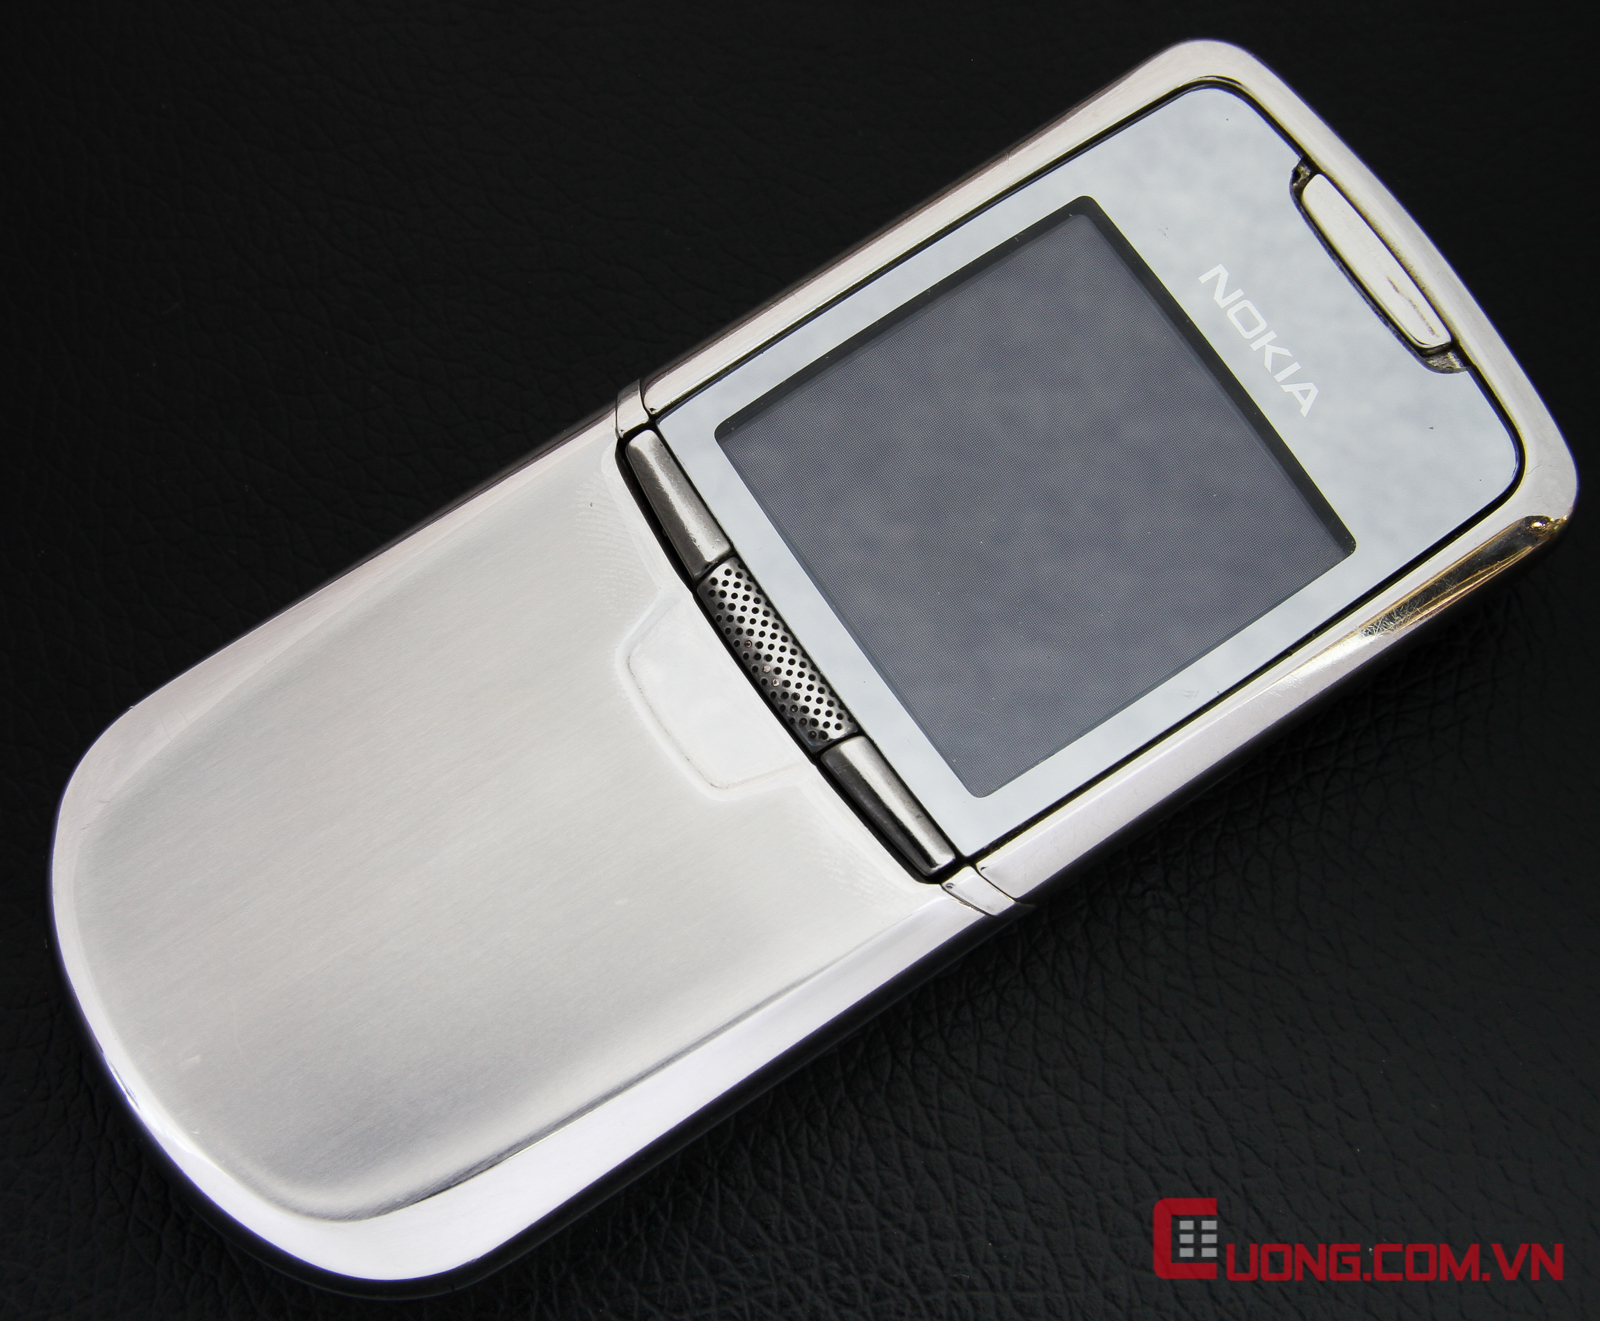 Nokia 8800 Anakin Sliver